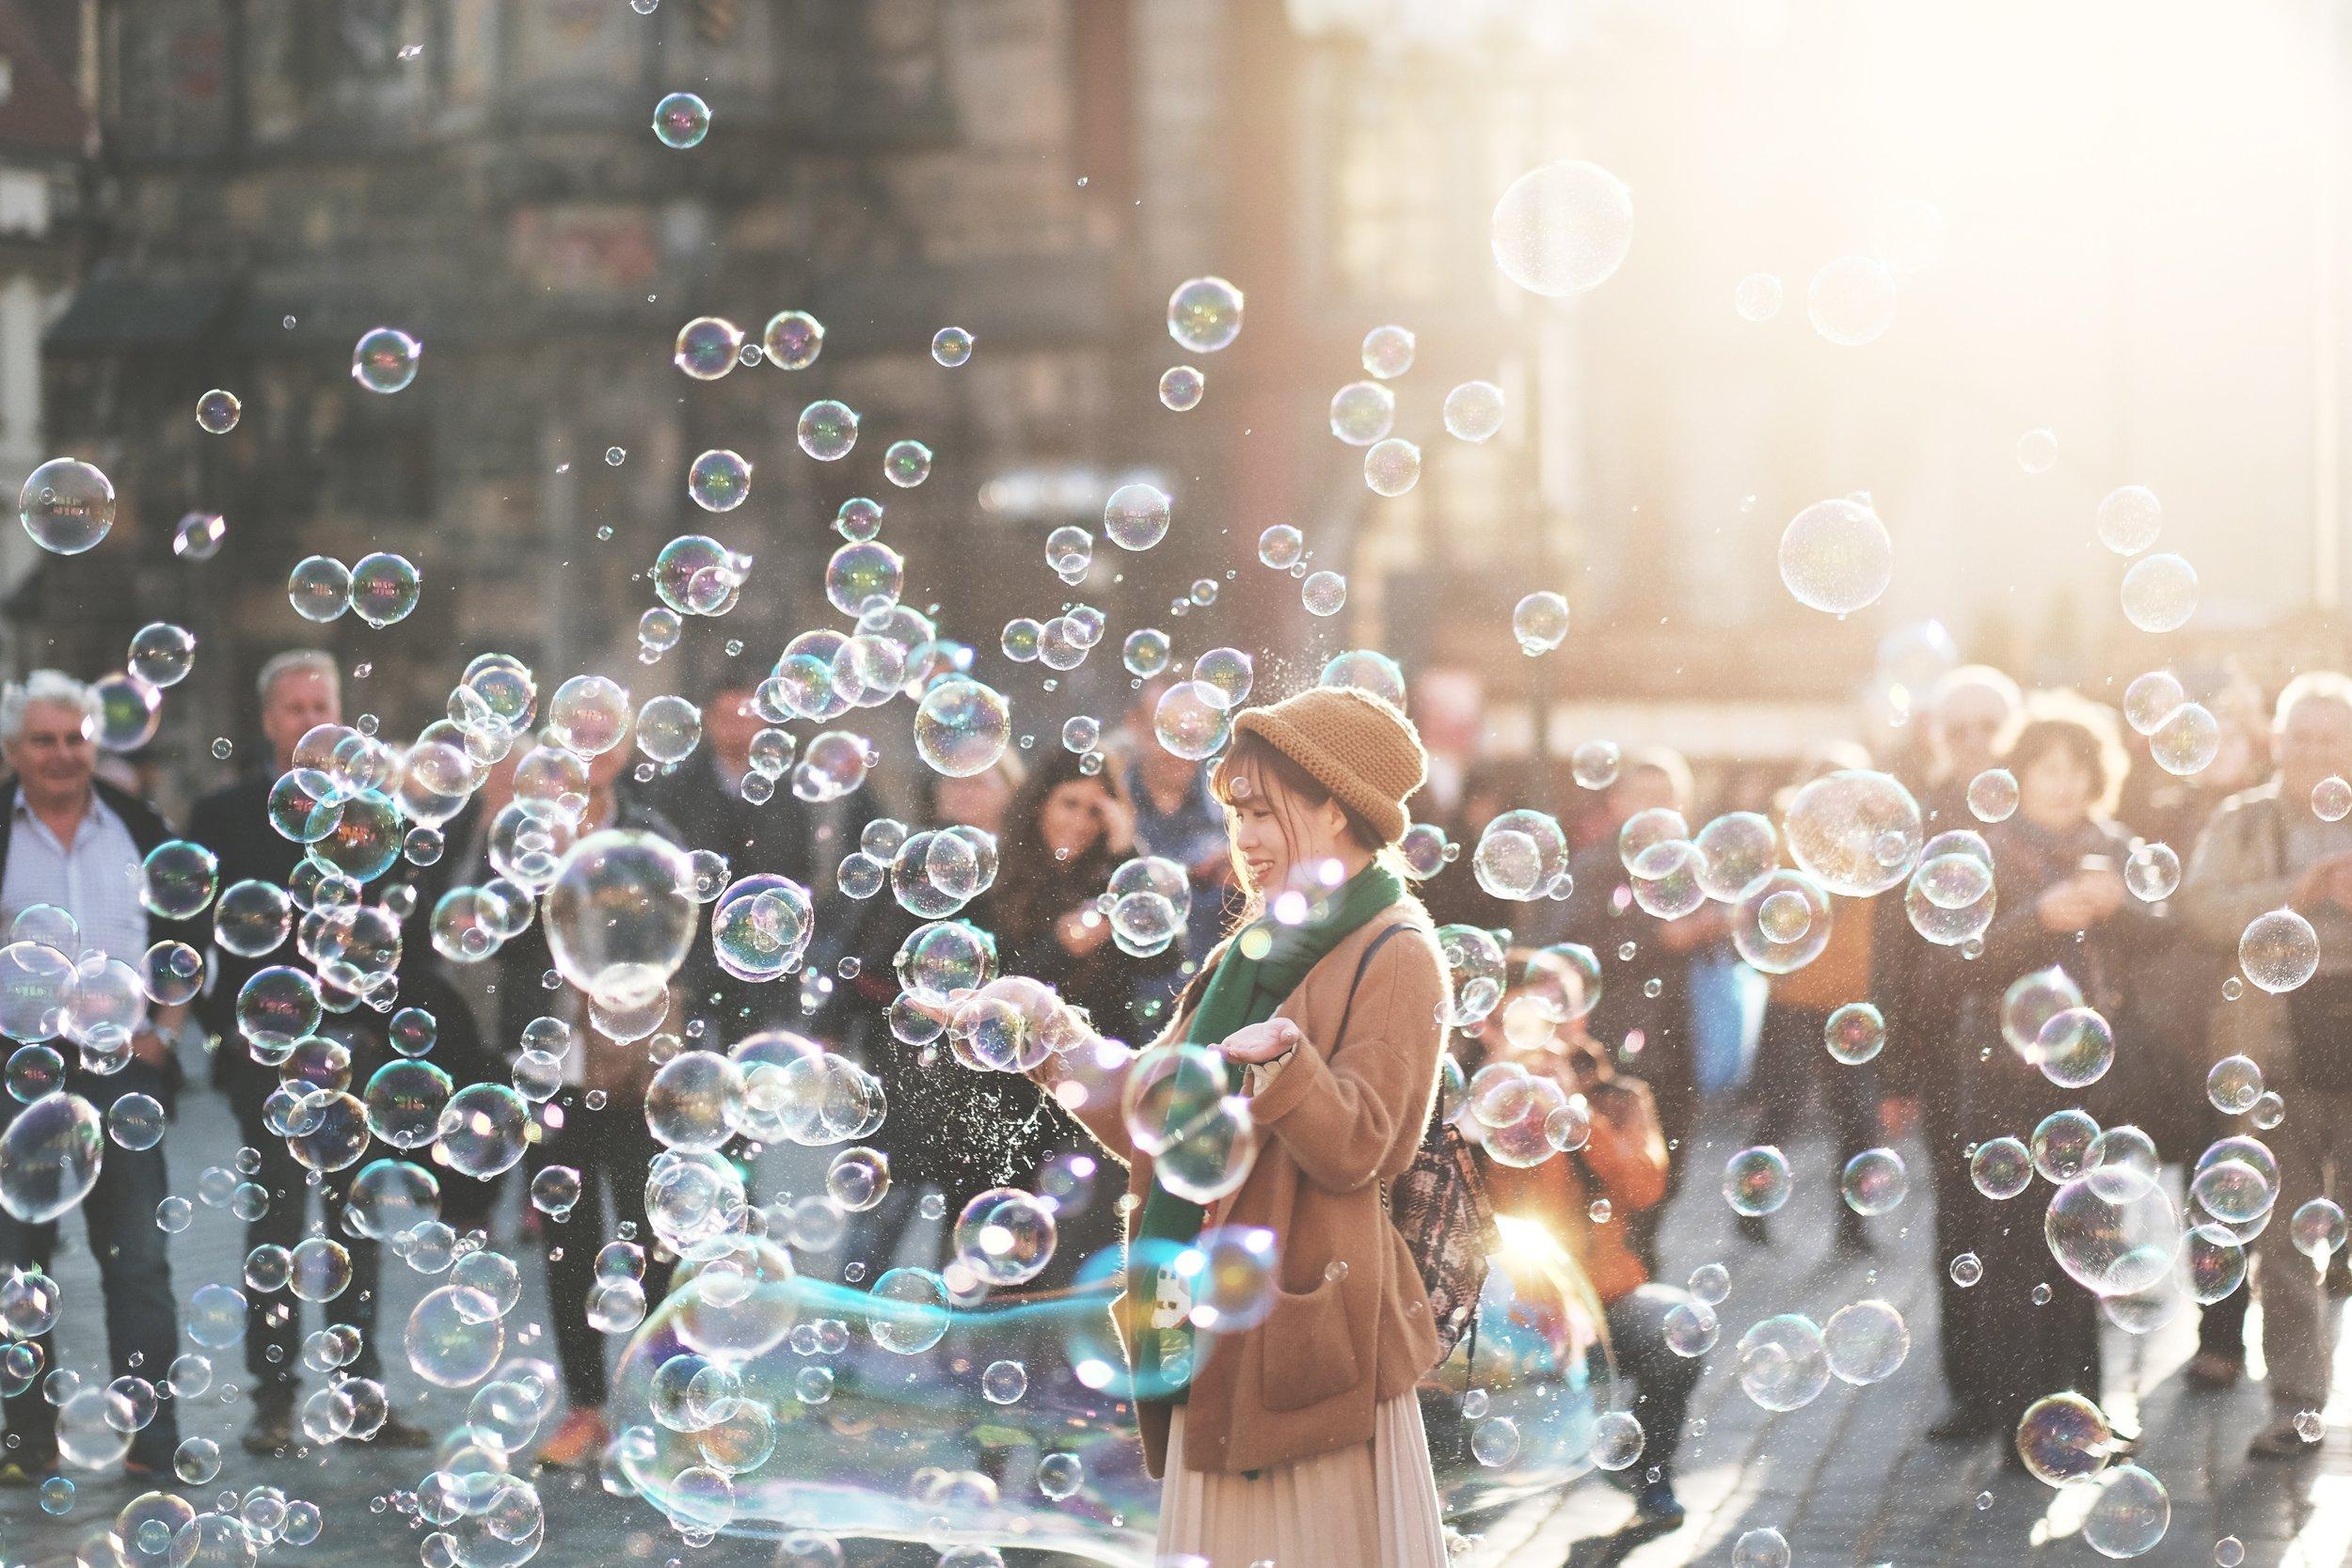 30 Ways to be an Extraordinary Human